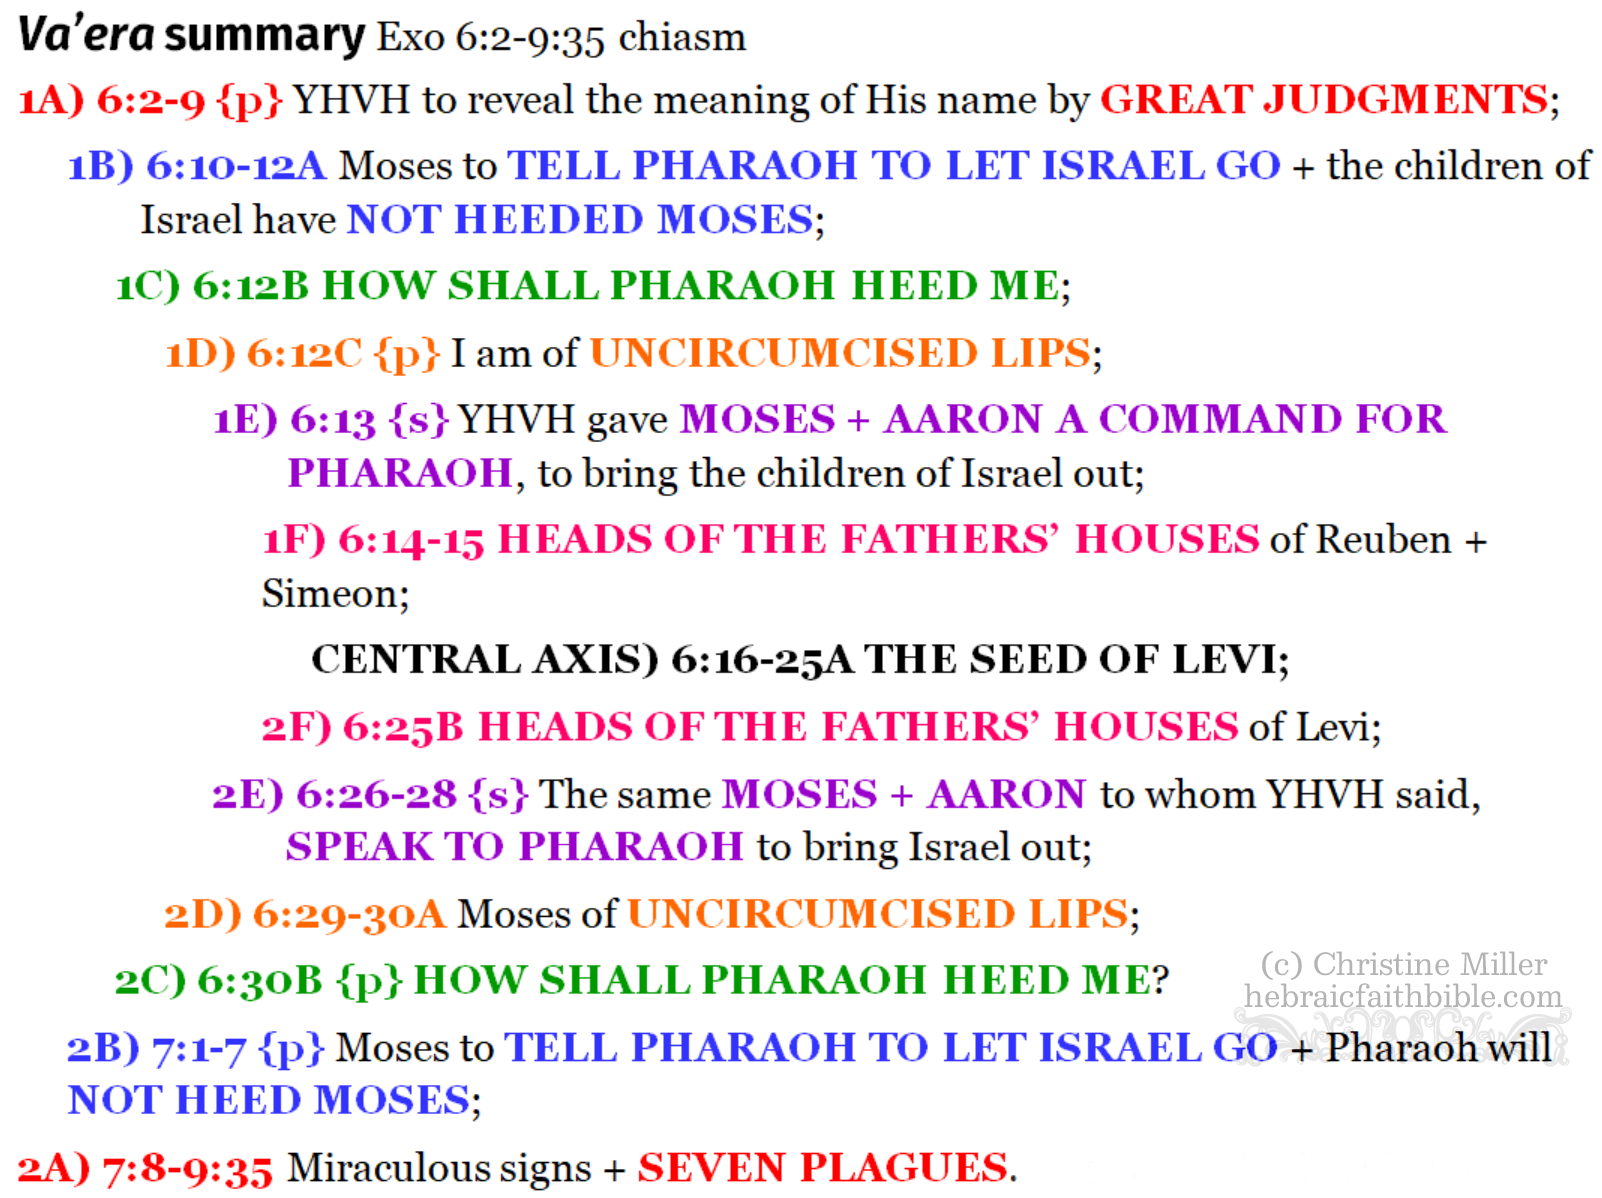 Exo 6:2-9:35 Va'era chiasm summary | hebraicfaithbible.com